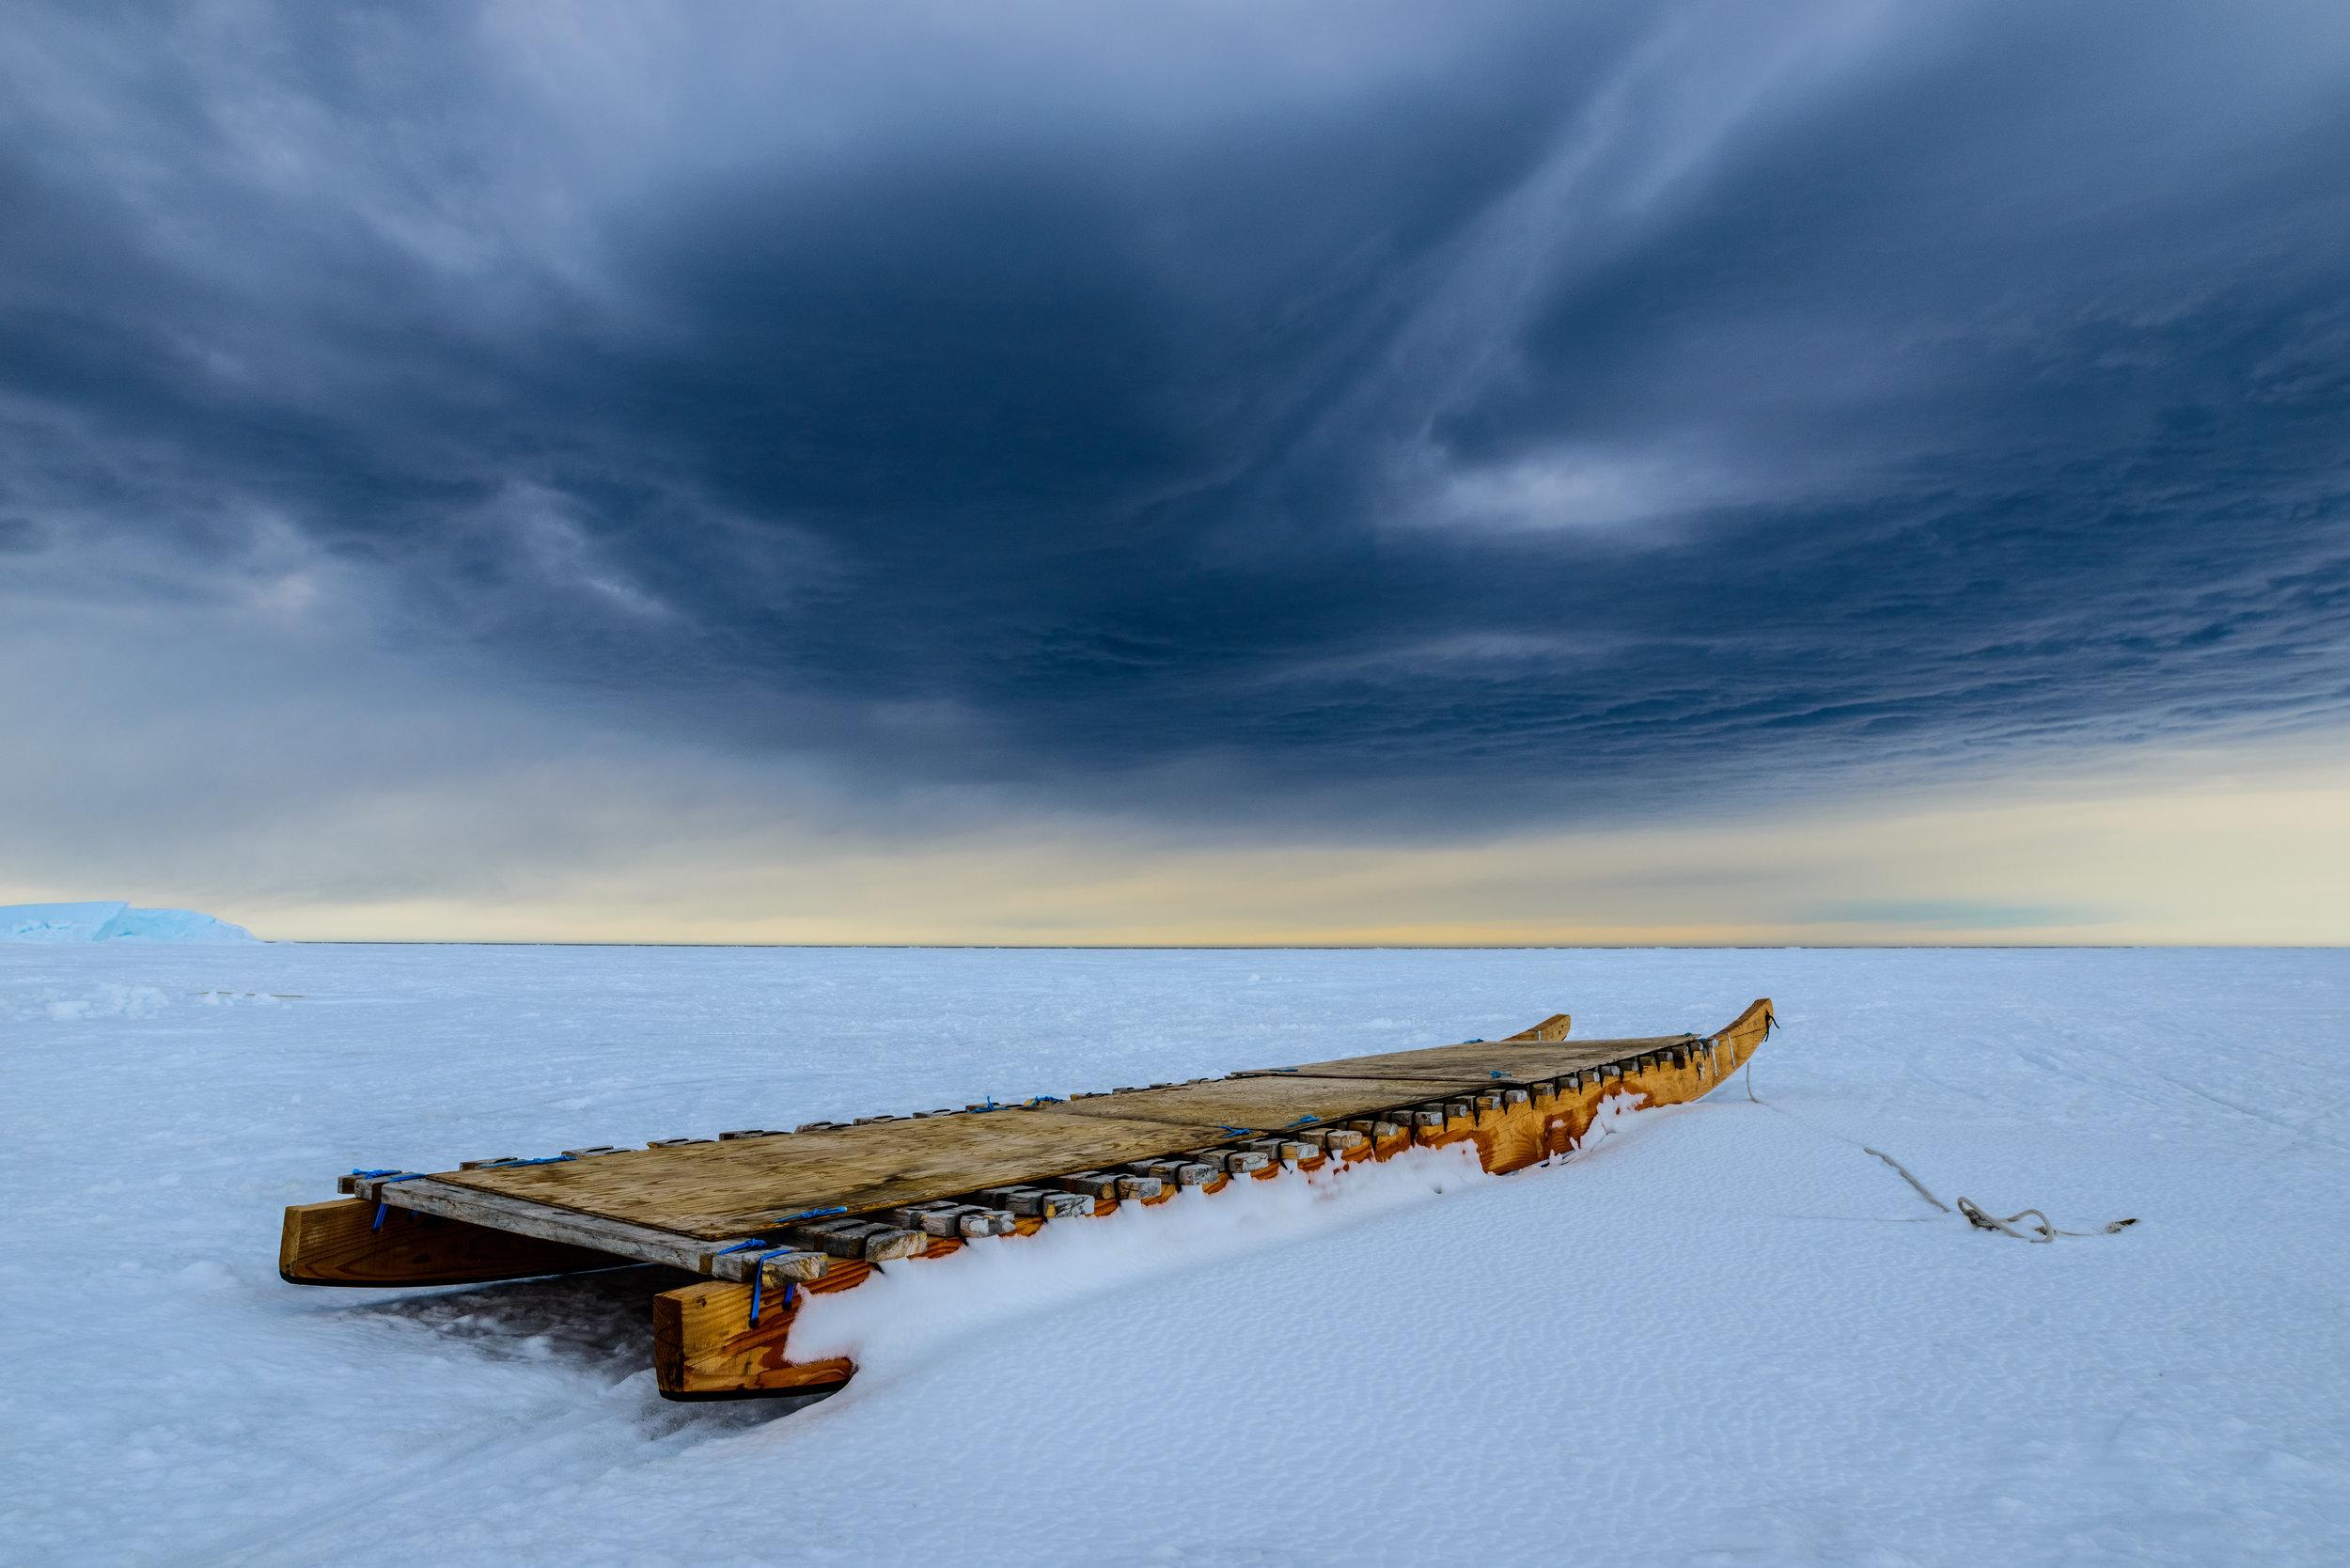 Inuit Komatic at the Floe Edge